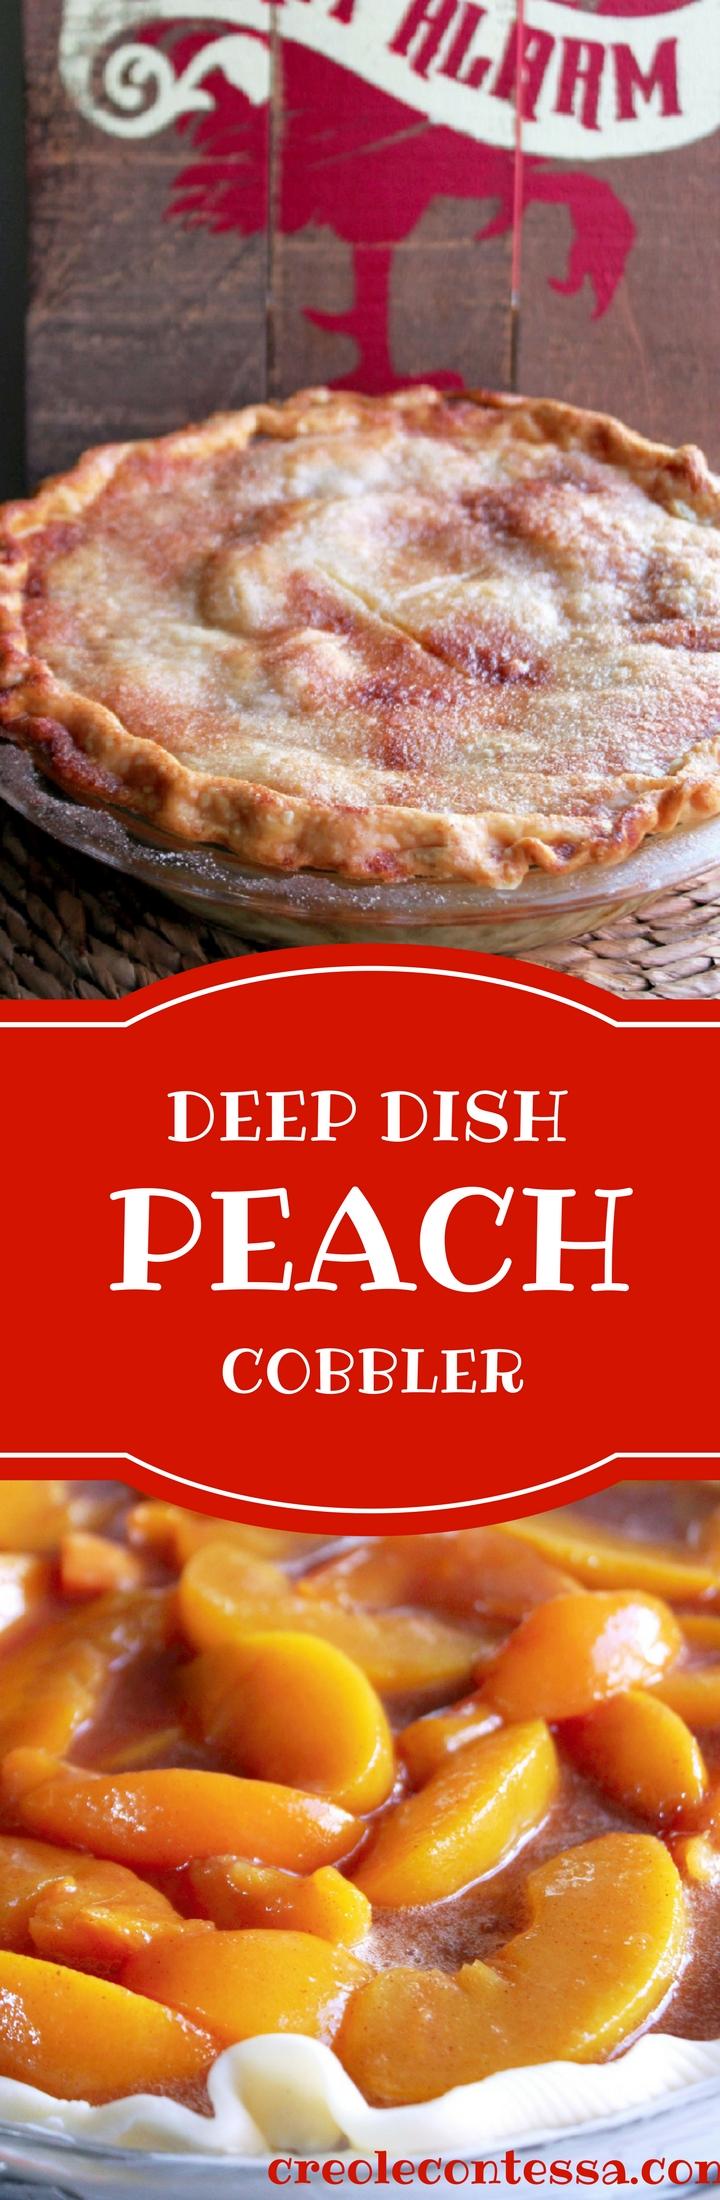 Deep Dish Peach Cobbler-Creole Contessa